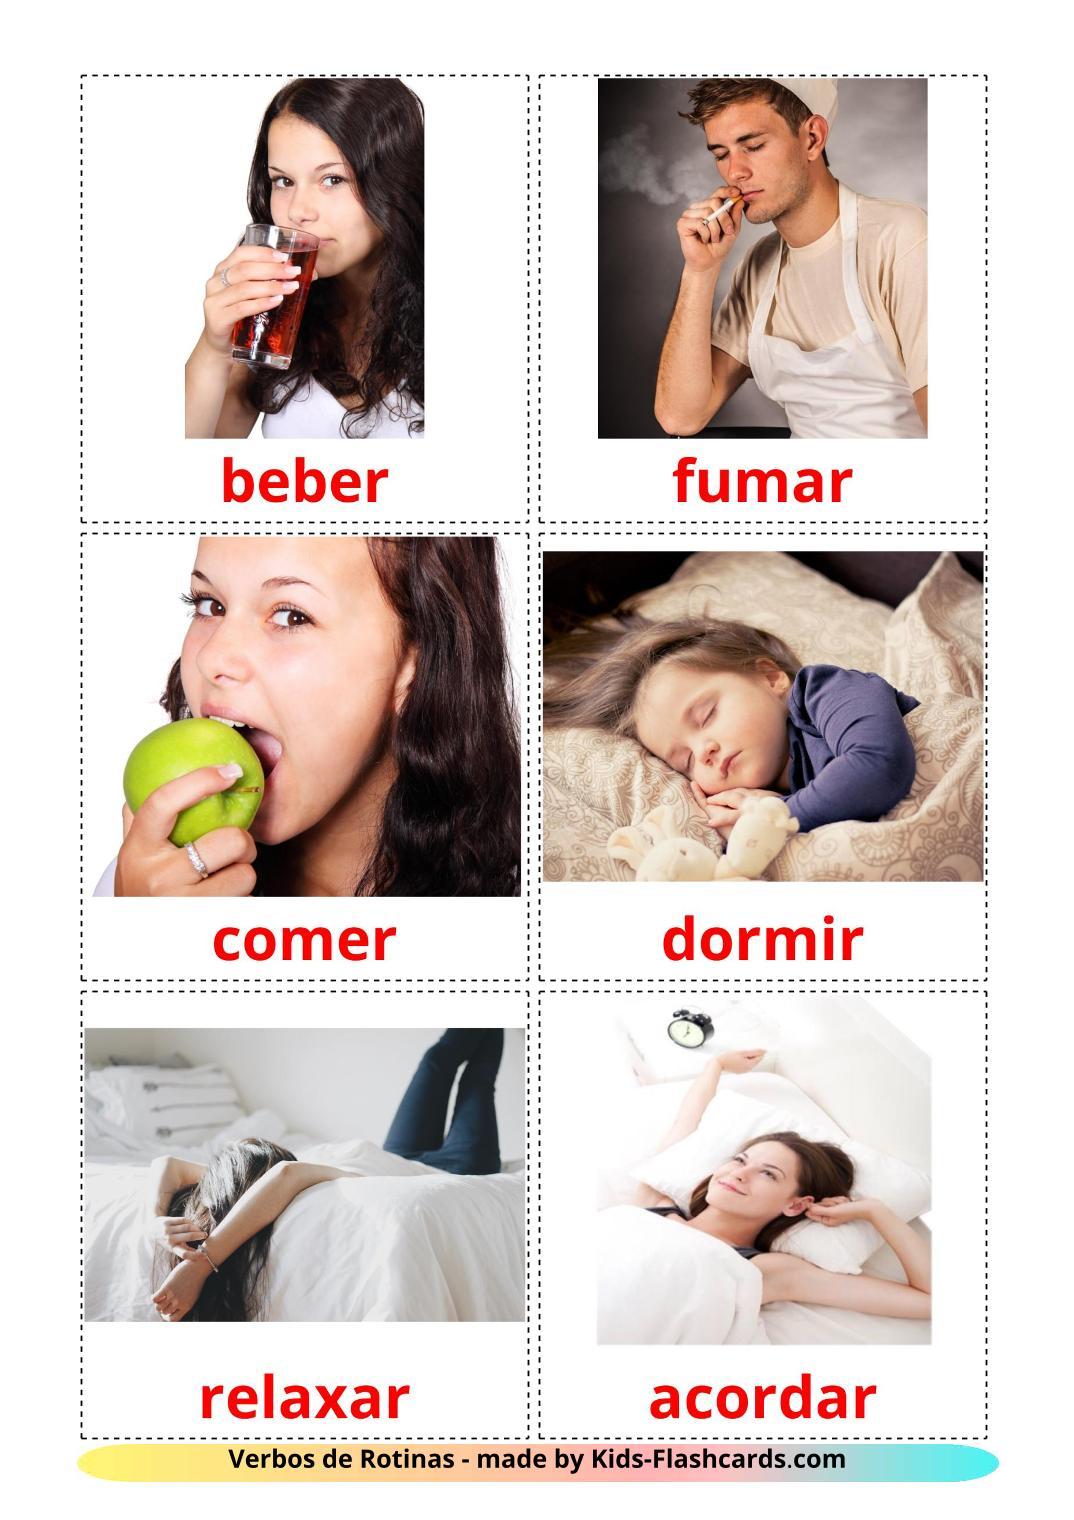 Routine verbs - 33 Free Printable portuguese Flashcards